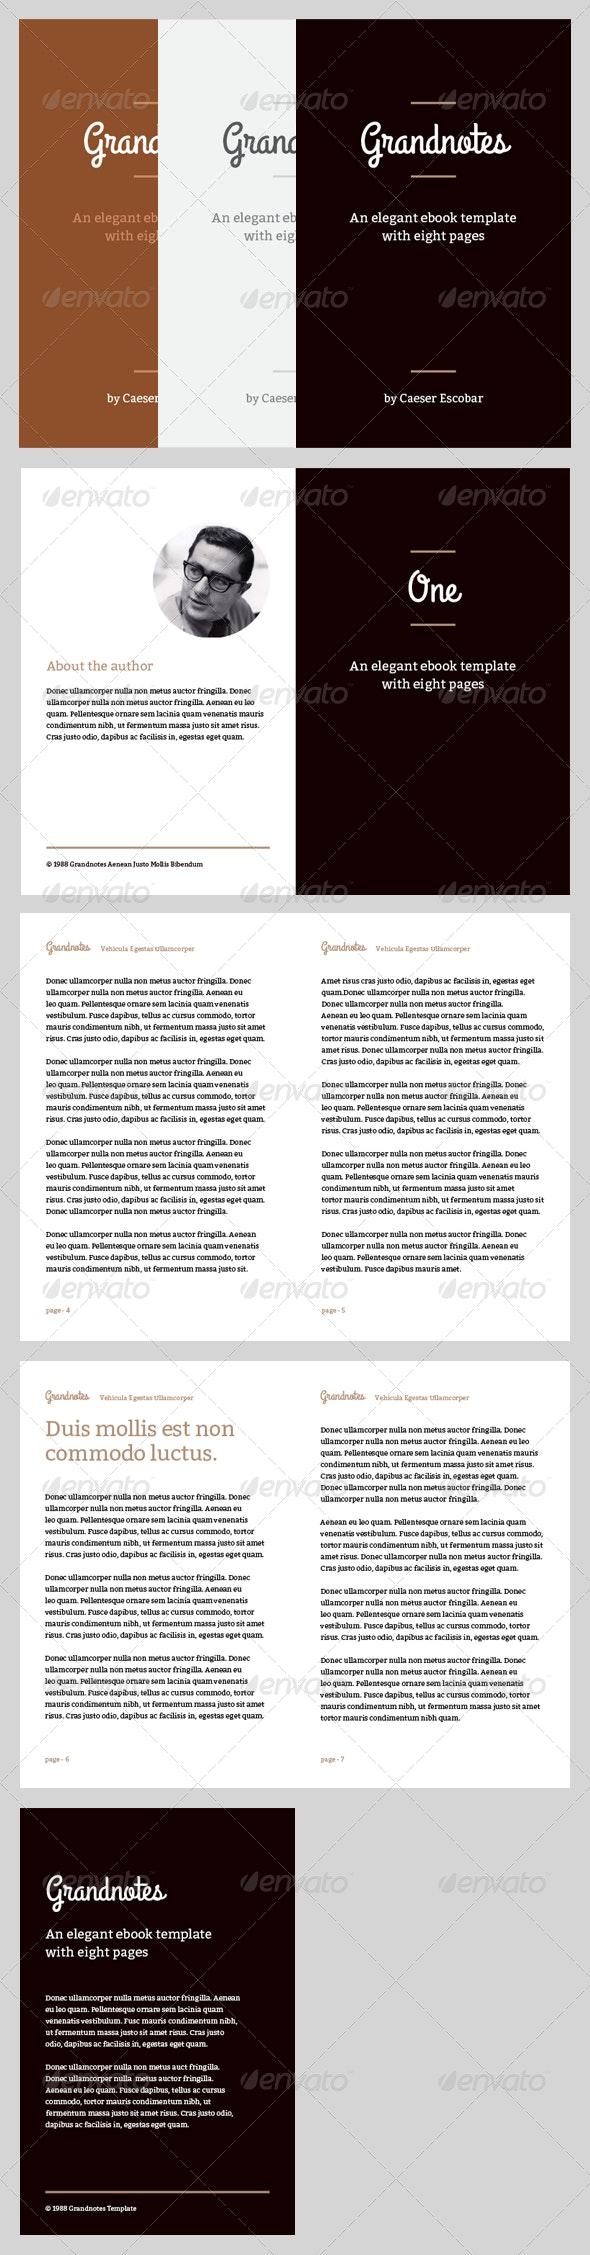 Grandnotes - eBook Template or Print Book - Miscellaneous Print Templates